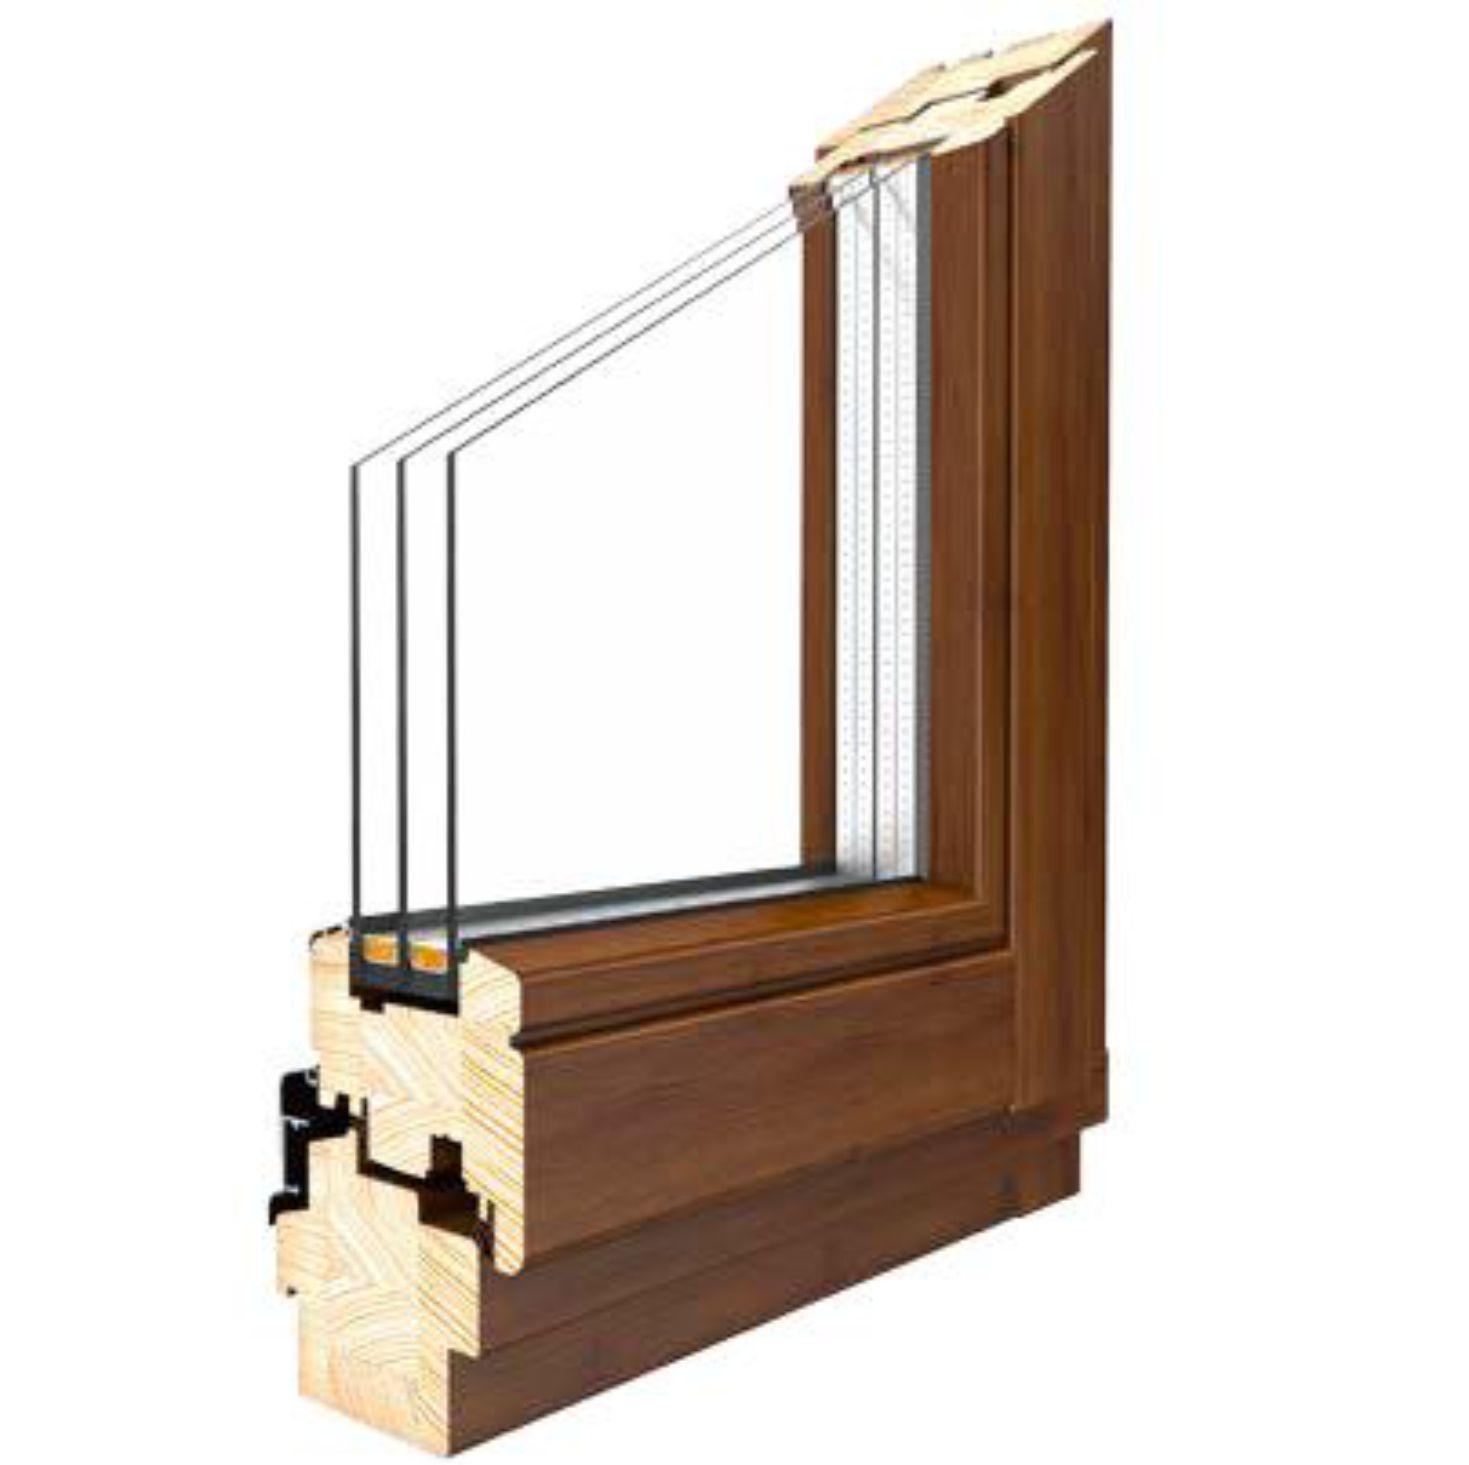 Holzfenster drutex softline 68 meranti holz fenster alle for Holzfenster shop